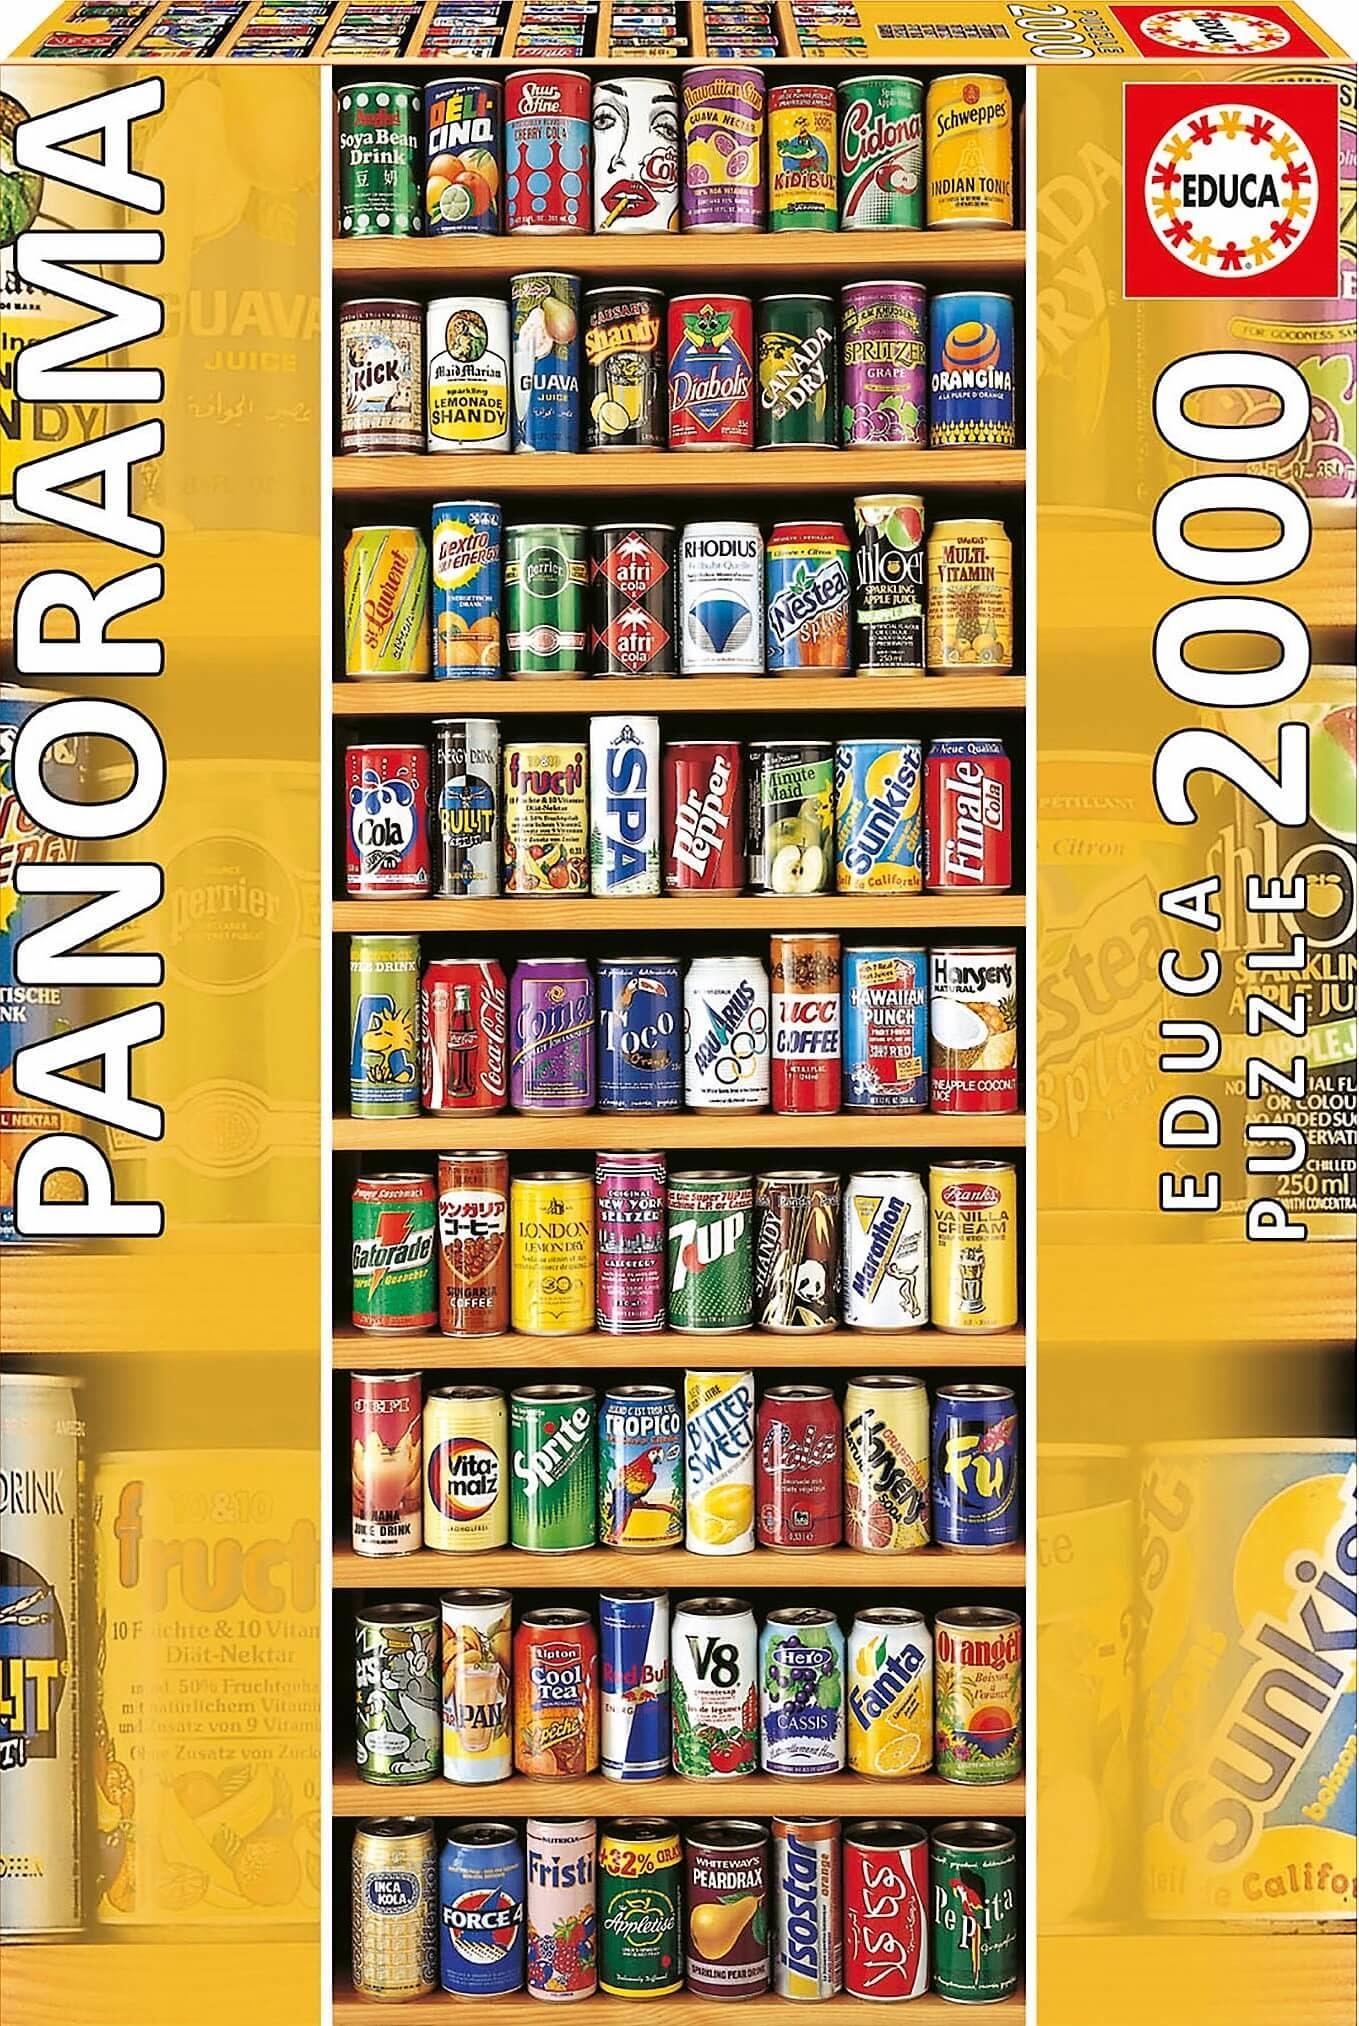 JOHN HANSEN COMPANY ED2000 SOFT DRINK CANS